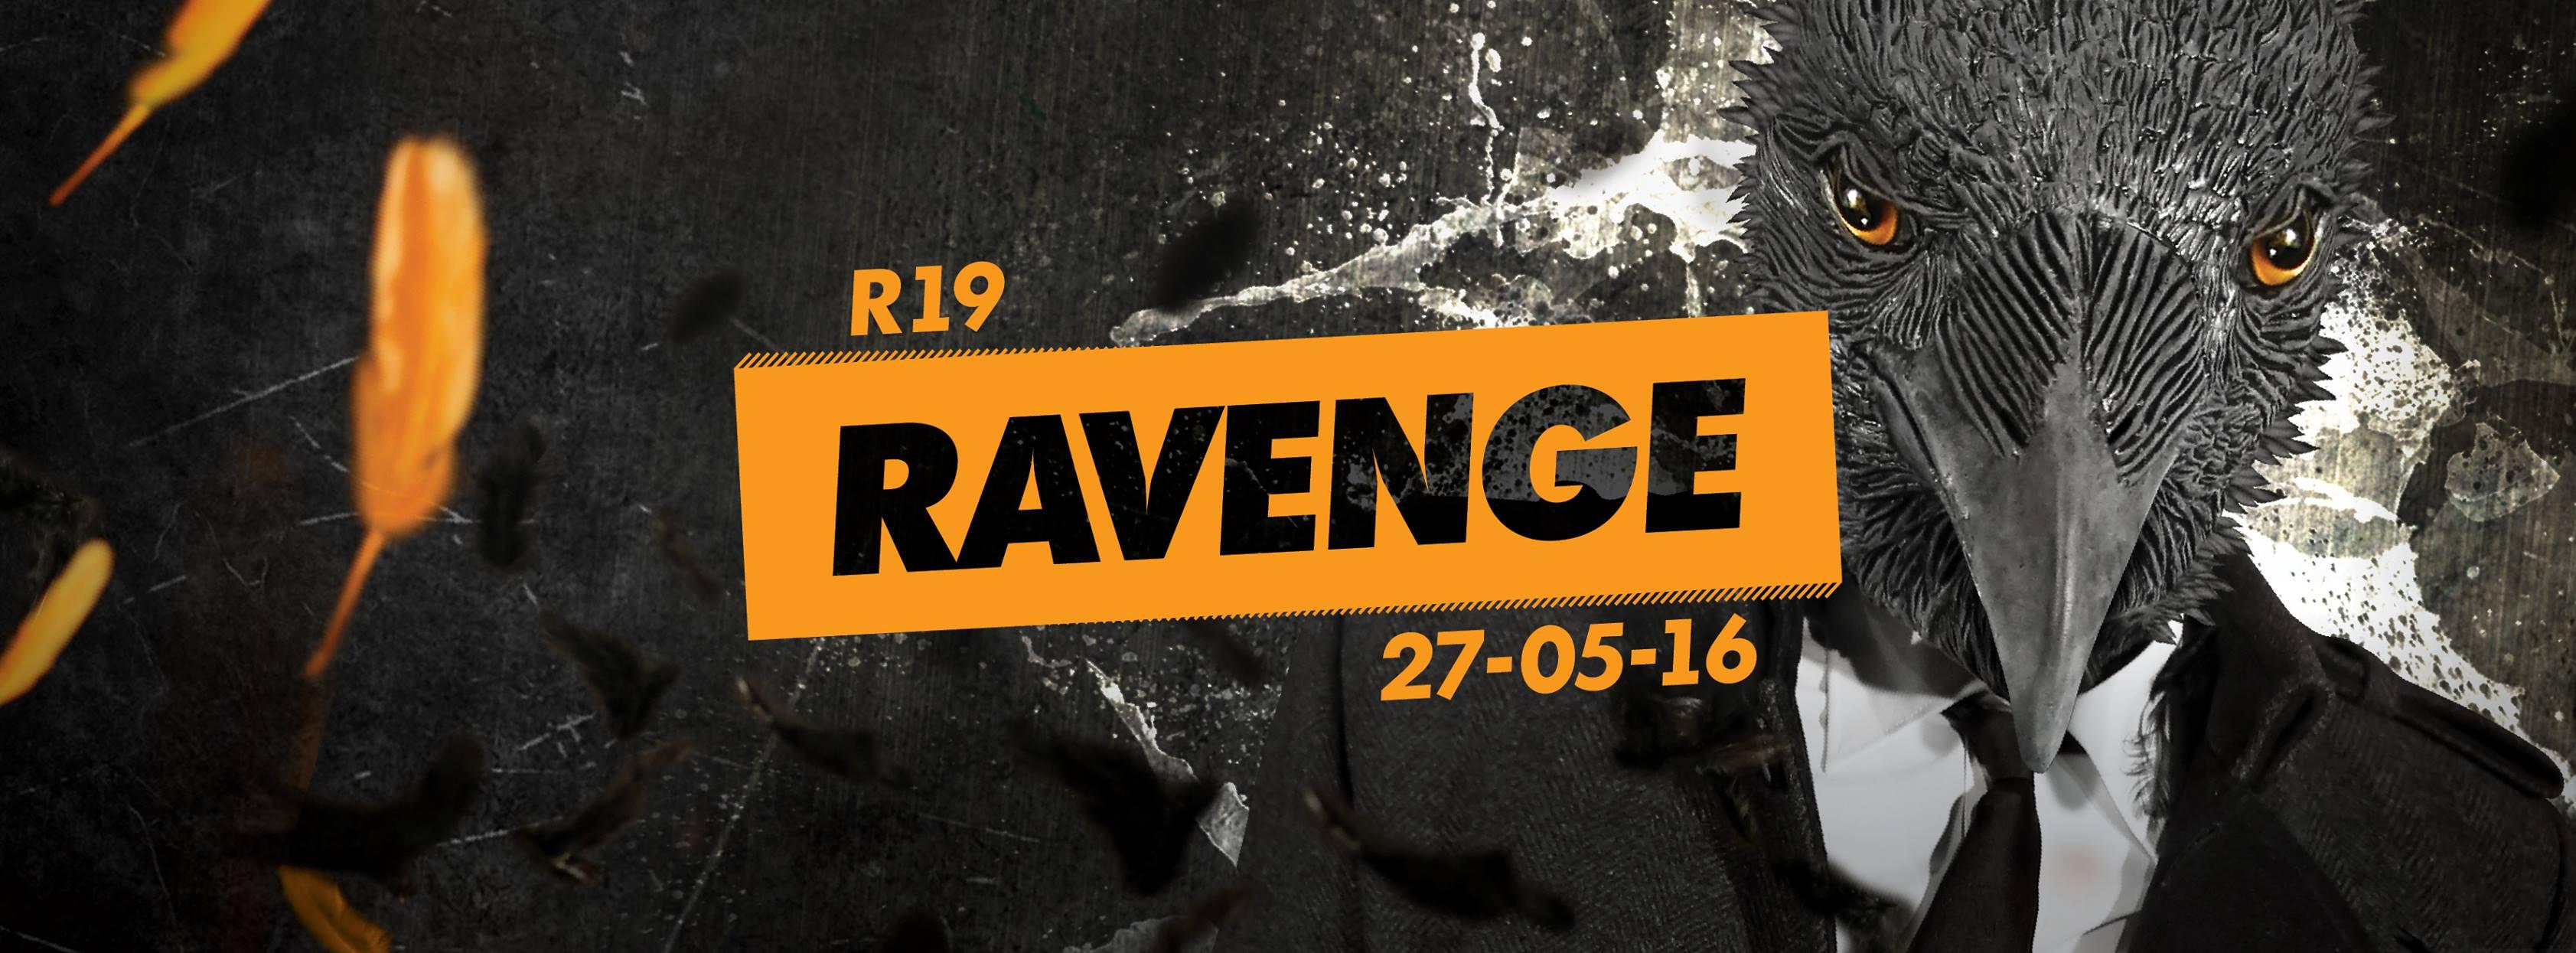 Marcel db live bei RAVENGE im R19-Club, Berlin